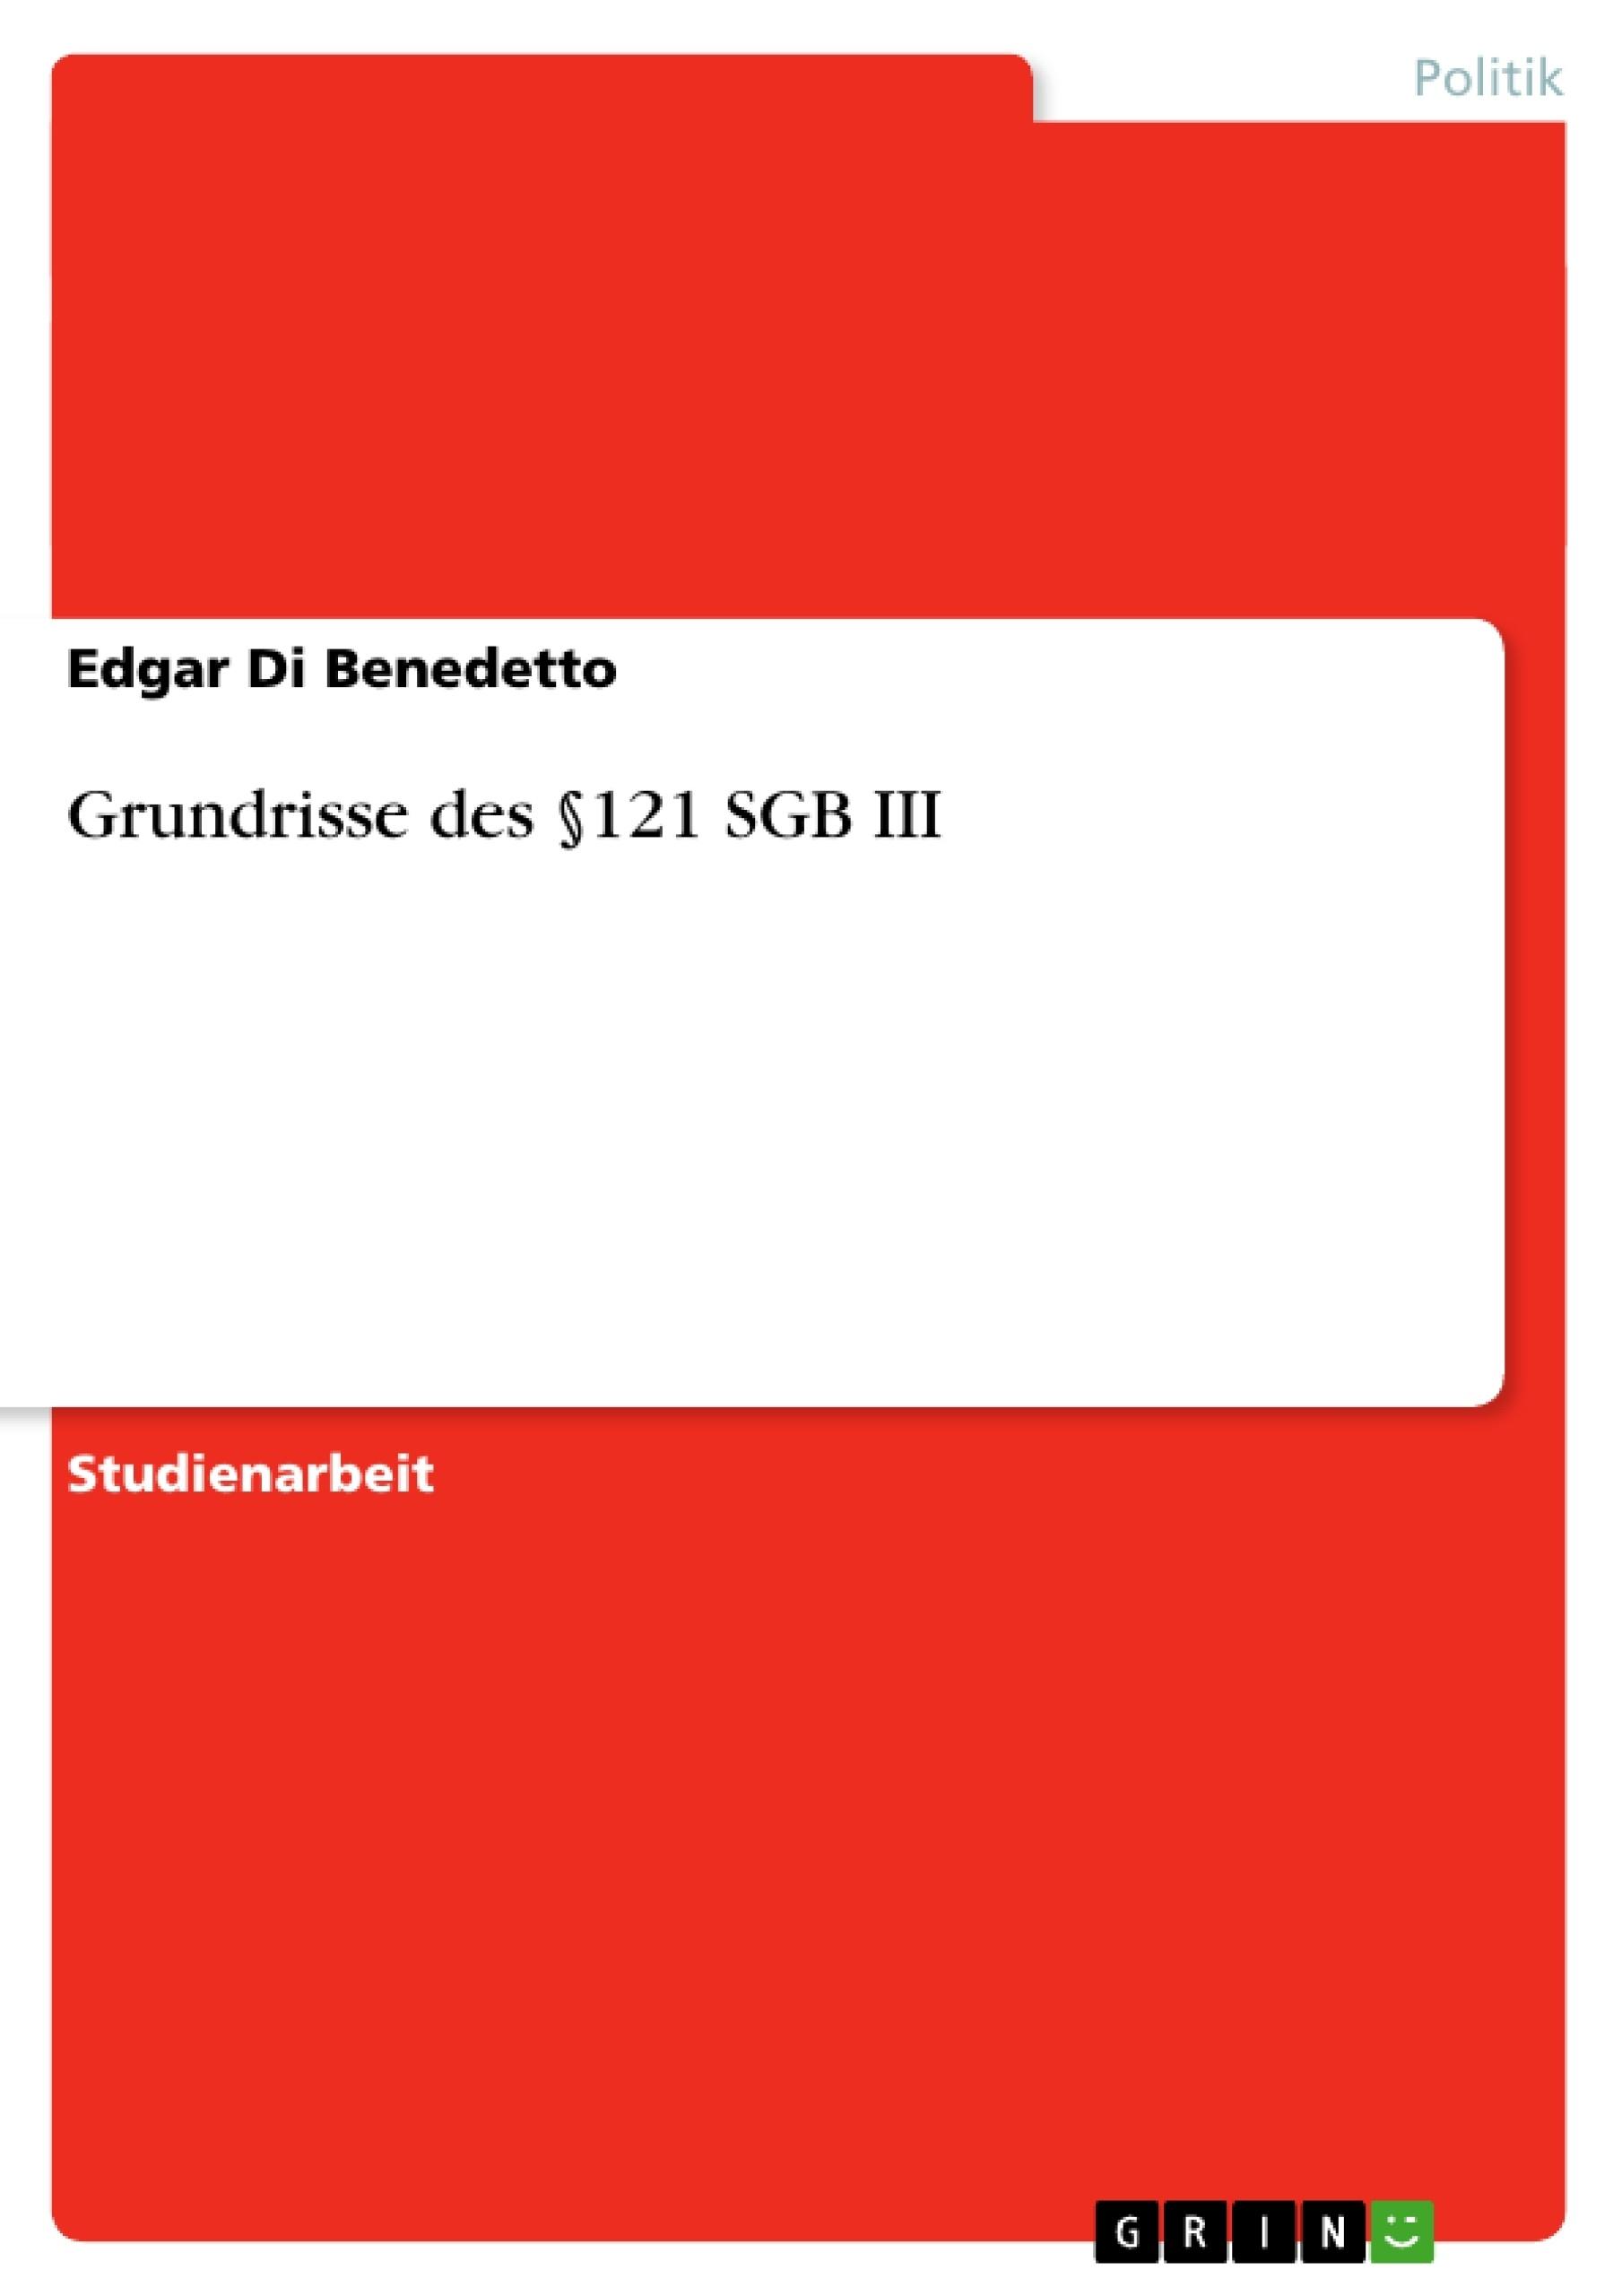 Titel: Grundrisse des §121 SGB III